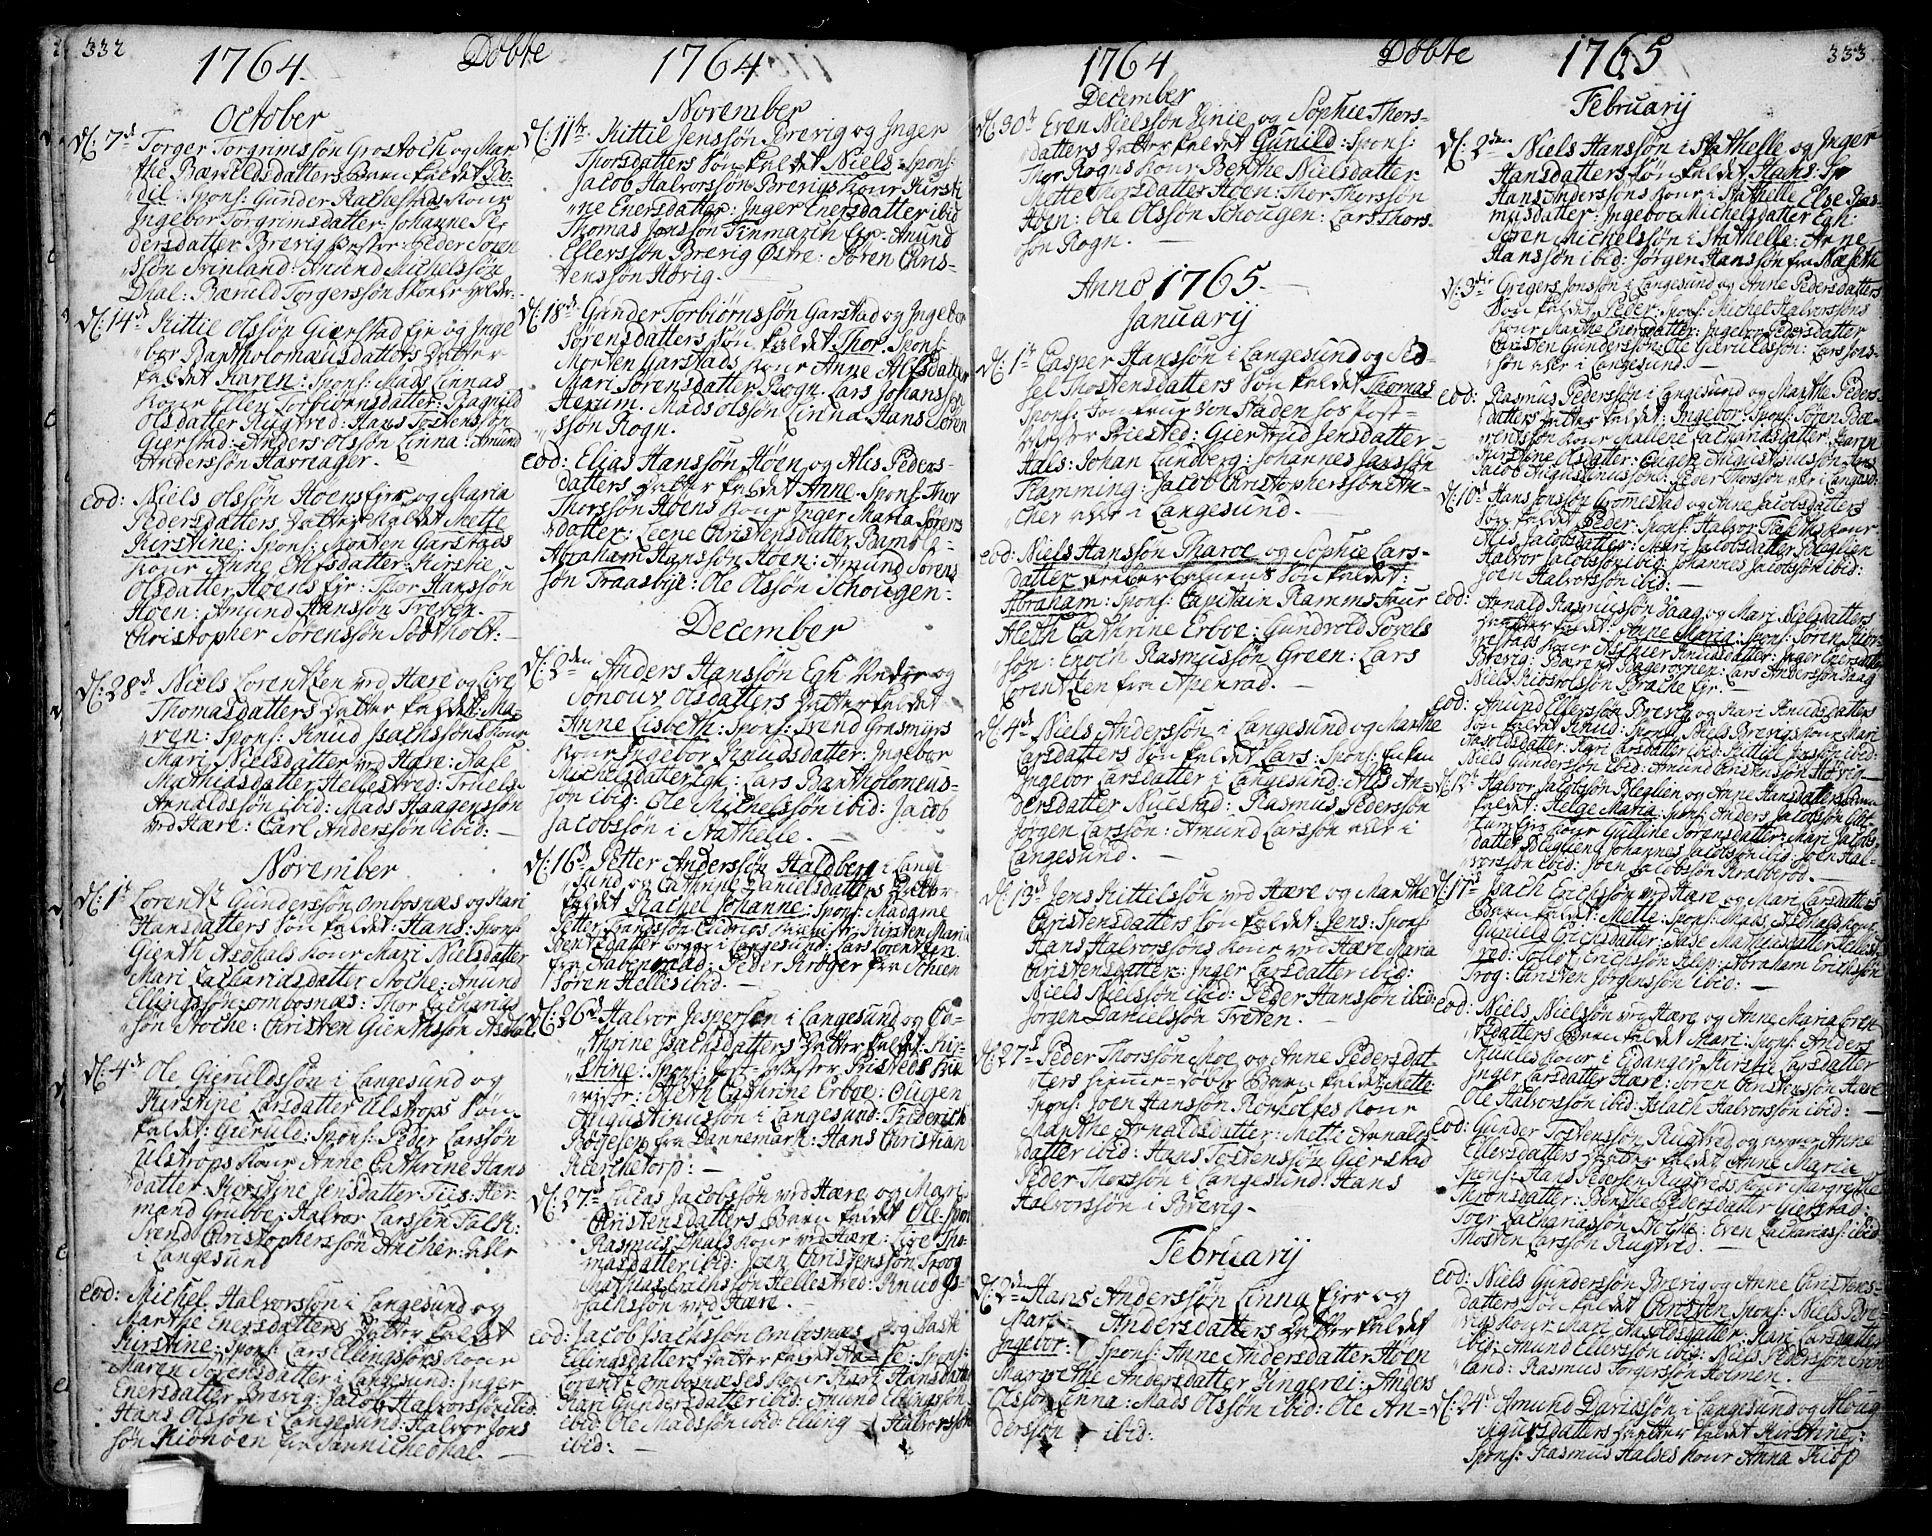 SAKO, Bamble kirkebøker, F/Fa/L0001: Ministerialbok nr. I 1, 1702-1774, s. 332-333